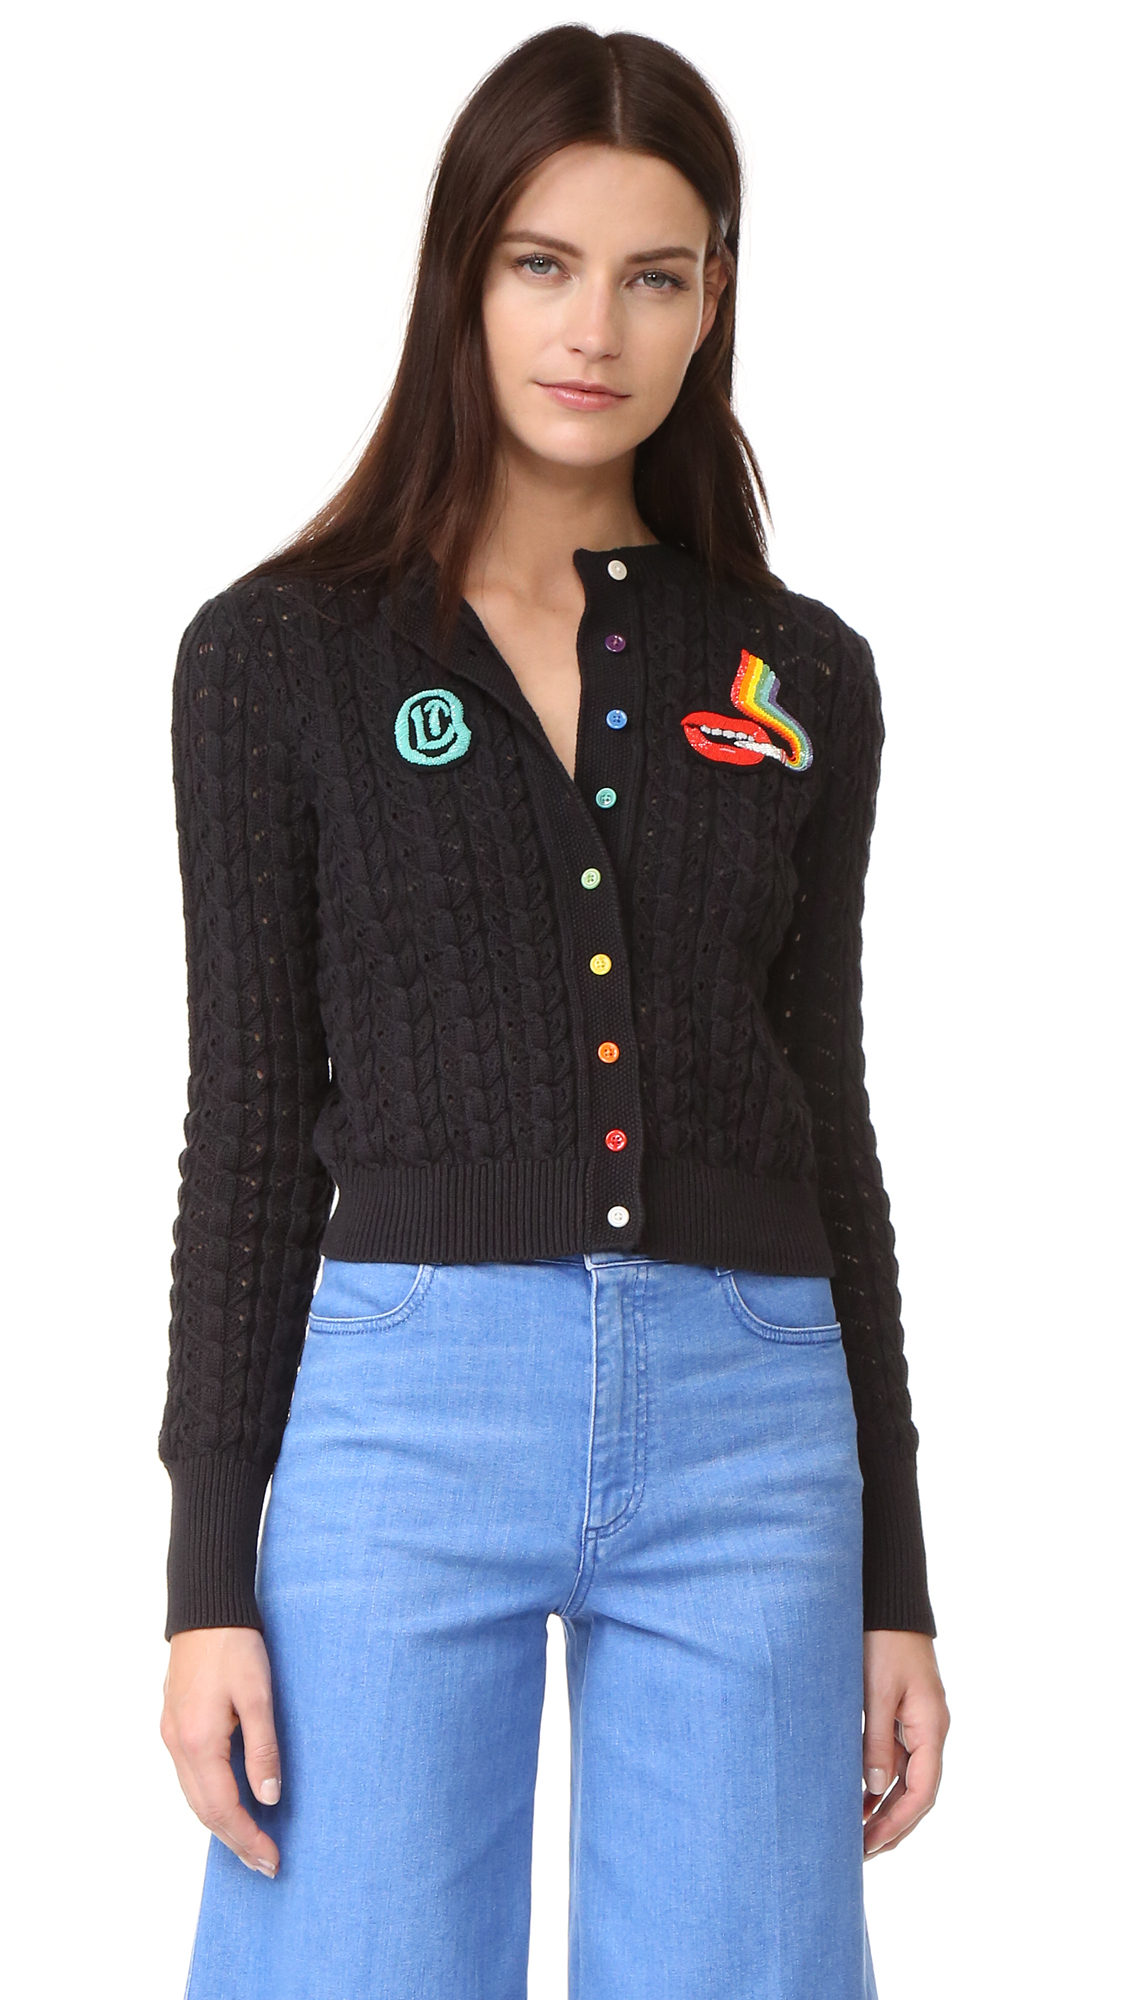 olympia letan female olympia letan cardigan dutches jacket black